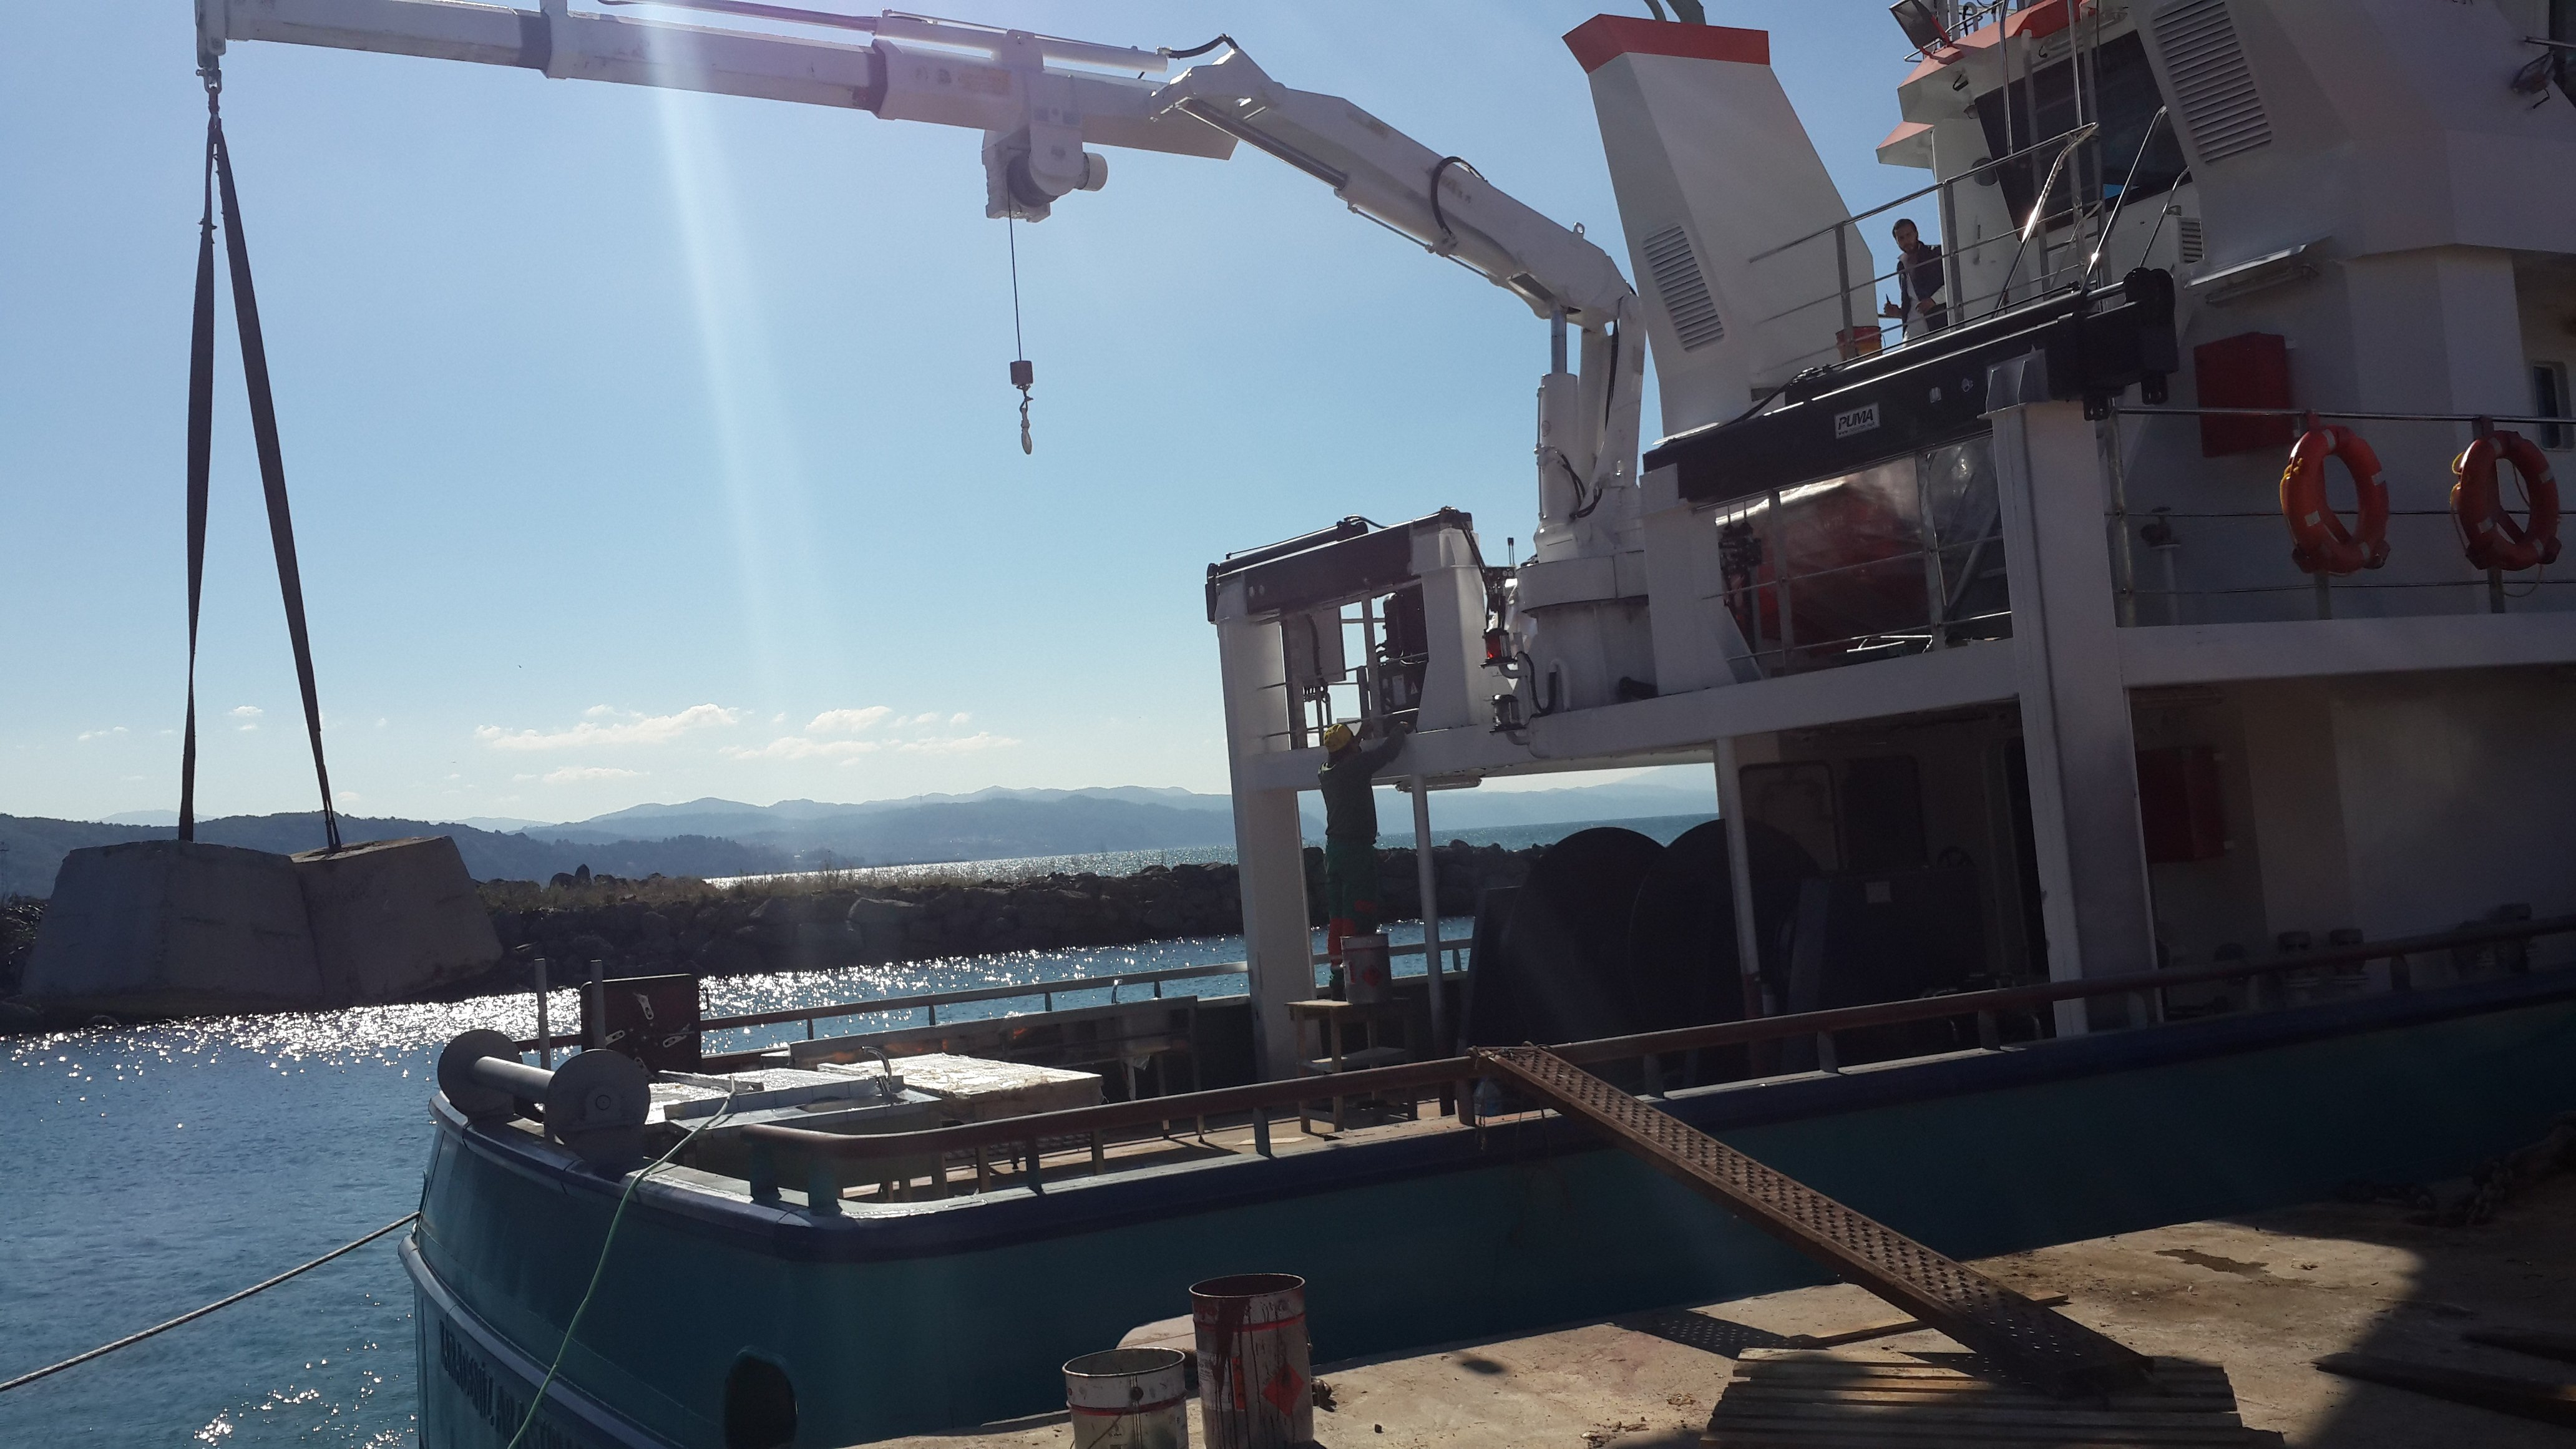 puma-marine-crane498575.jpg